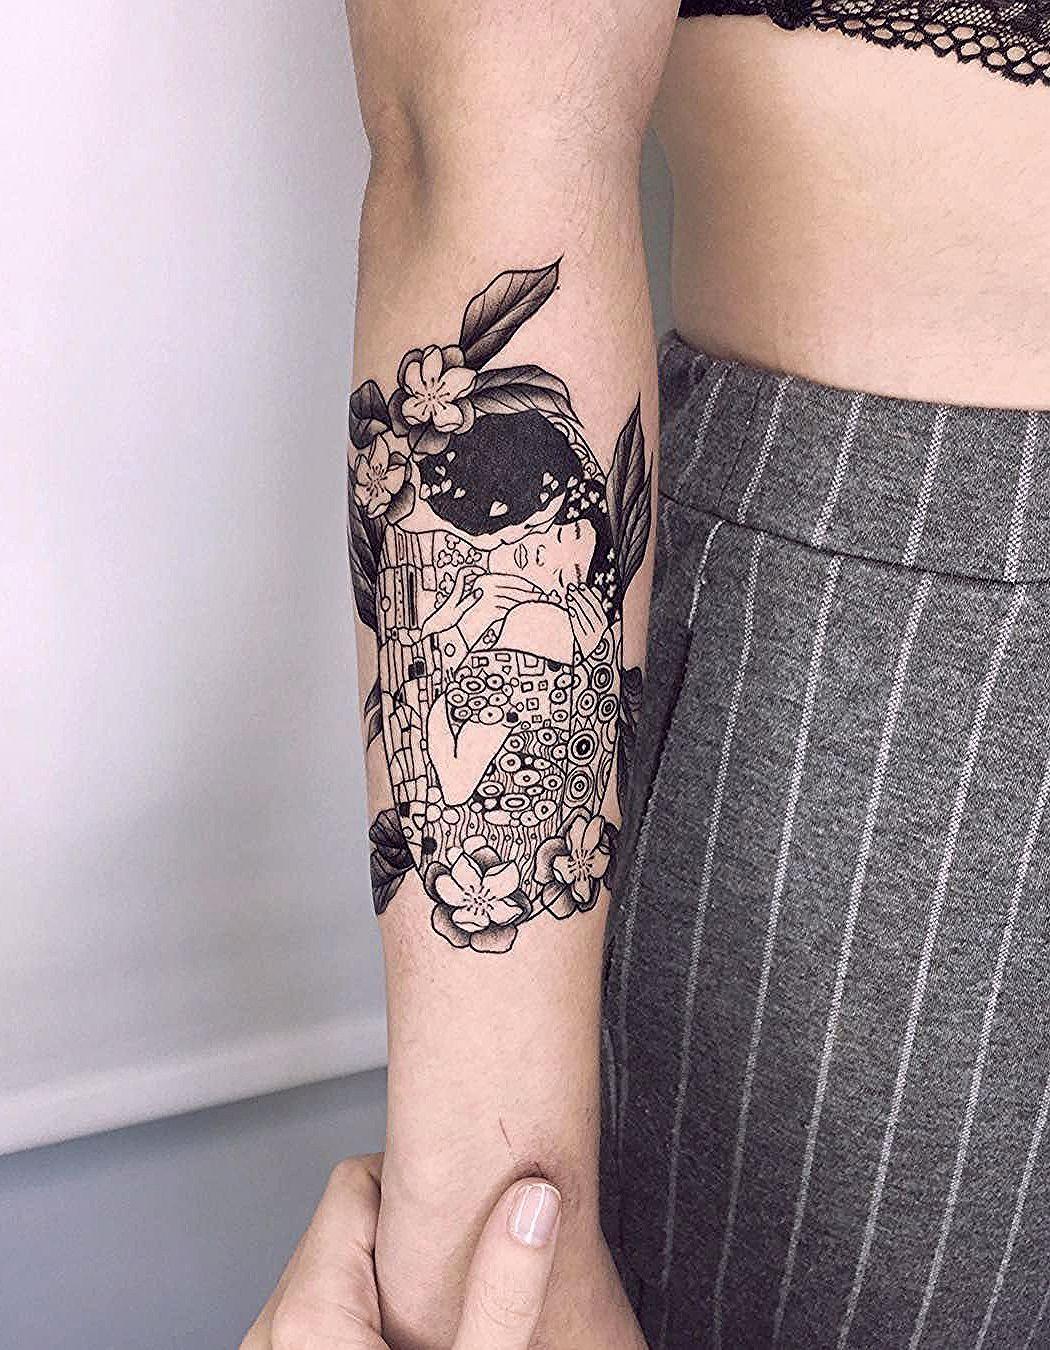 Adaptación Del El Beso De Klimt Klimt Blackworktattoo Des True Nouveau Tattoo Art Nouveau Tattoo Sleeve Tattoos